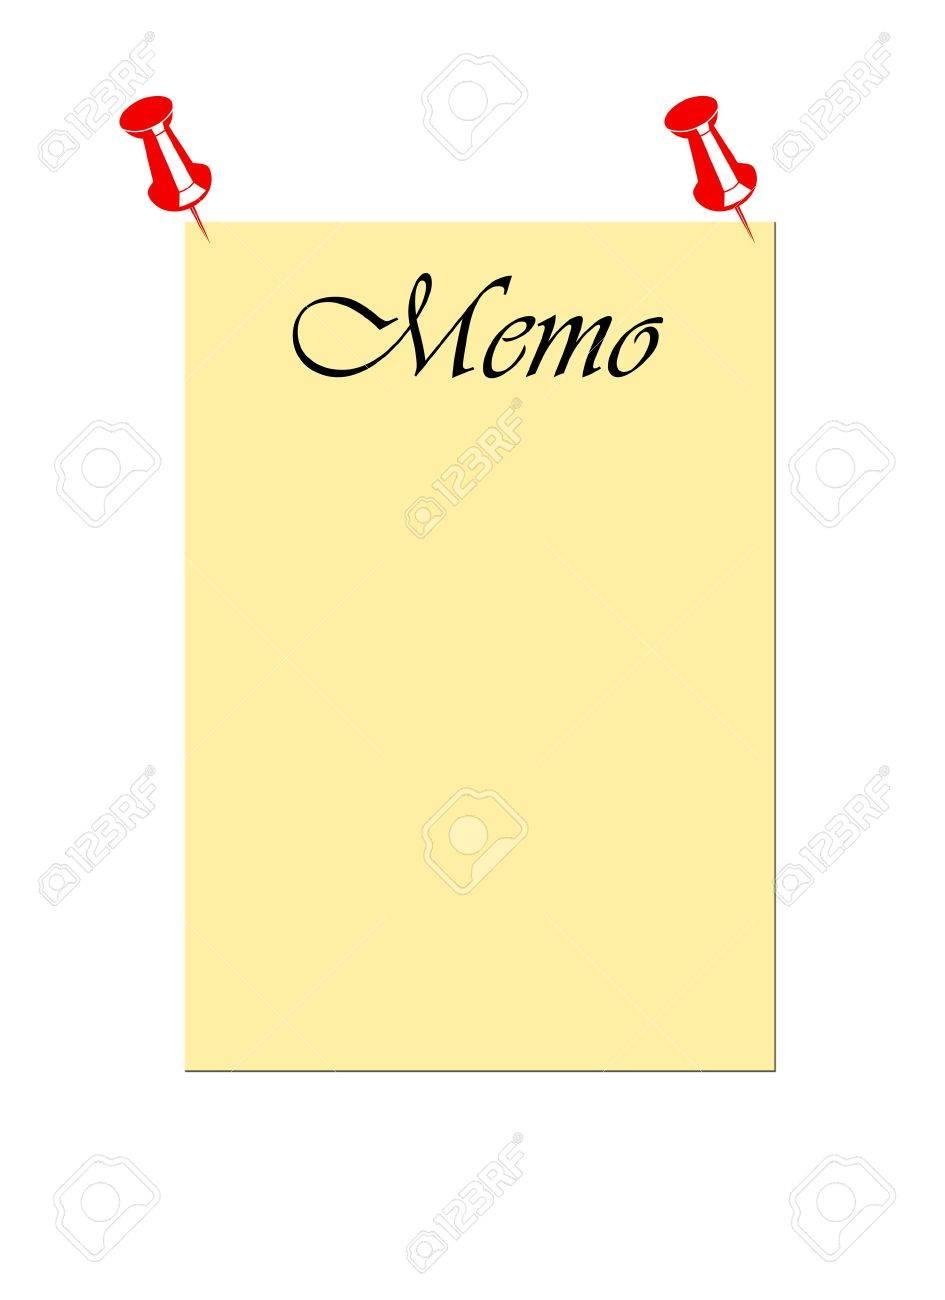 bloc notes nuls fixe avec des punaises isol eacute e sur fond blanc bloc notes nuls fixe avec des punaises isolatildecopye sur fond blanc